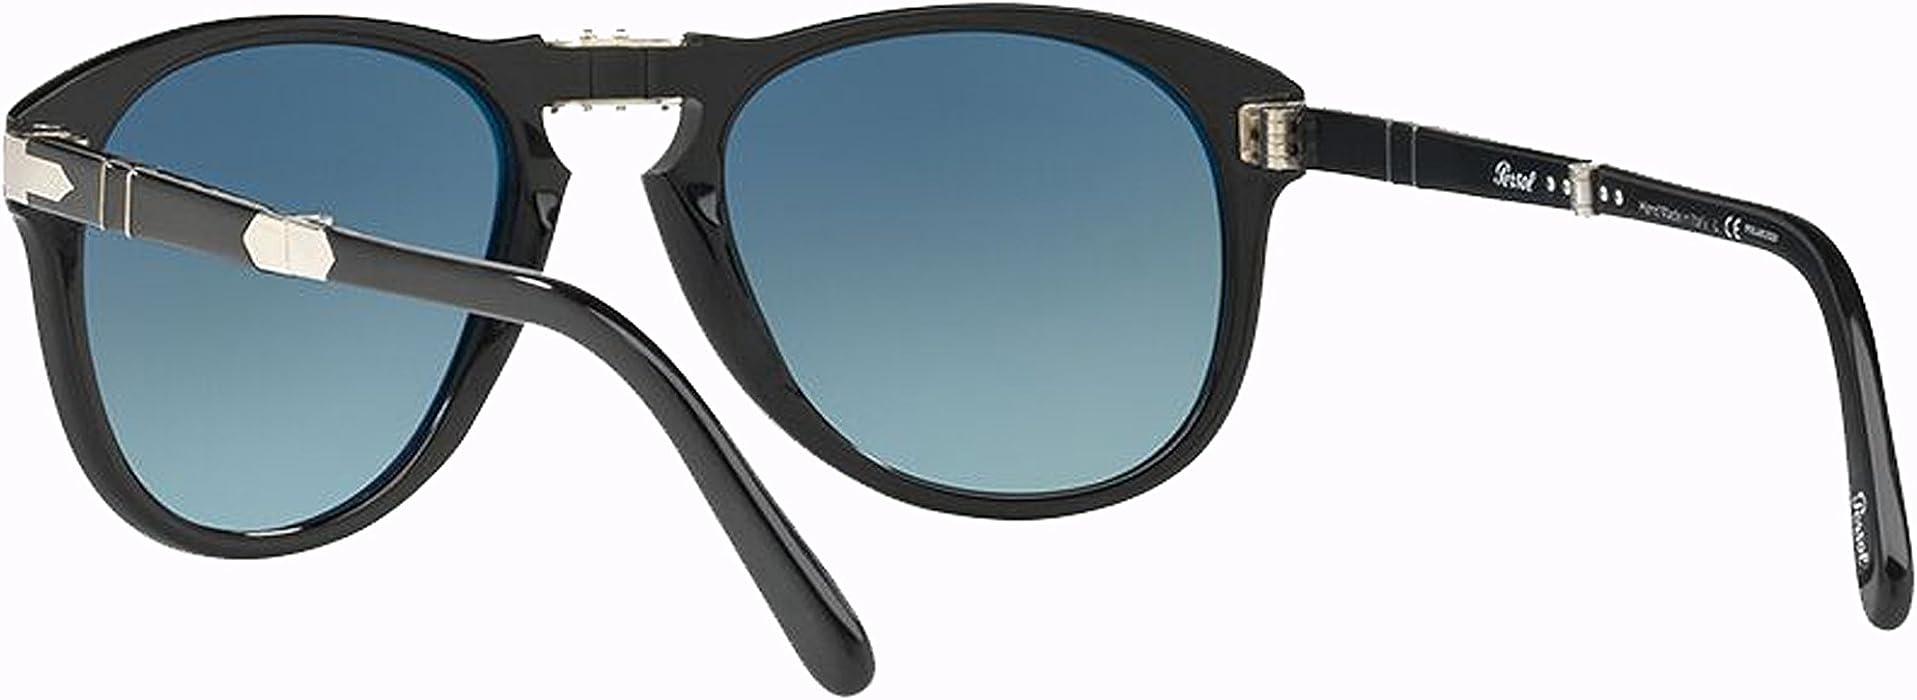 5f2cd6193363 Persol PO0714SM Steve McQueen sunglasses. Size 54. Color Black (95/S3).  Back. Double-tap to zoom